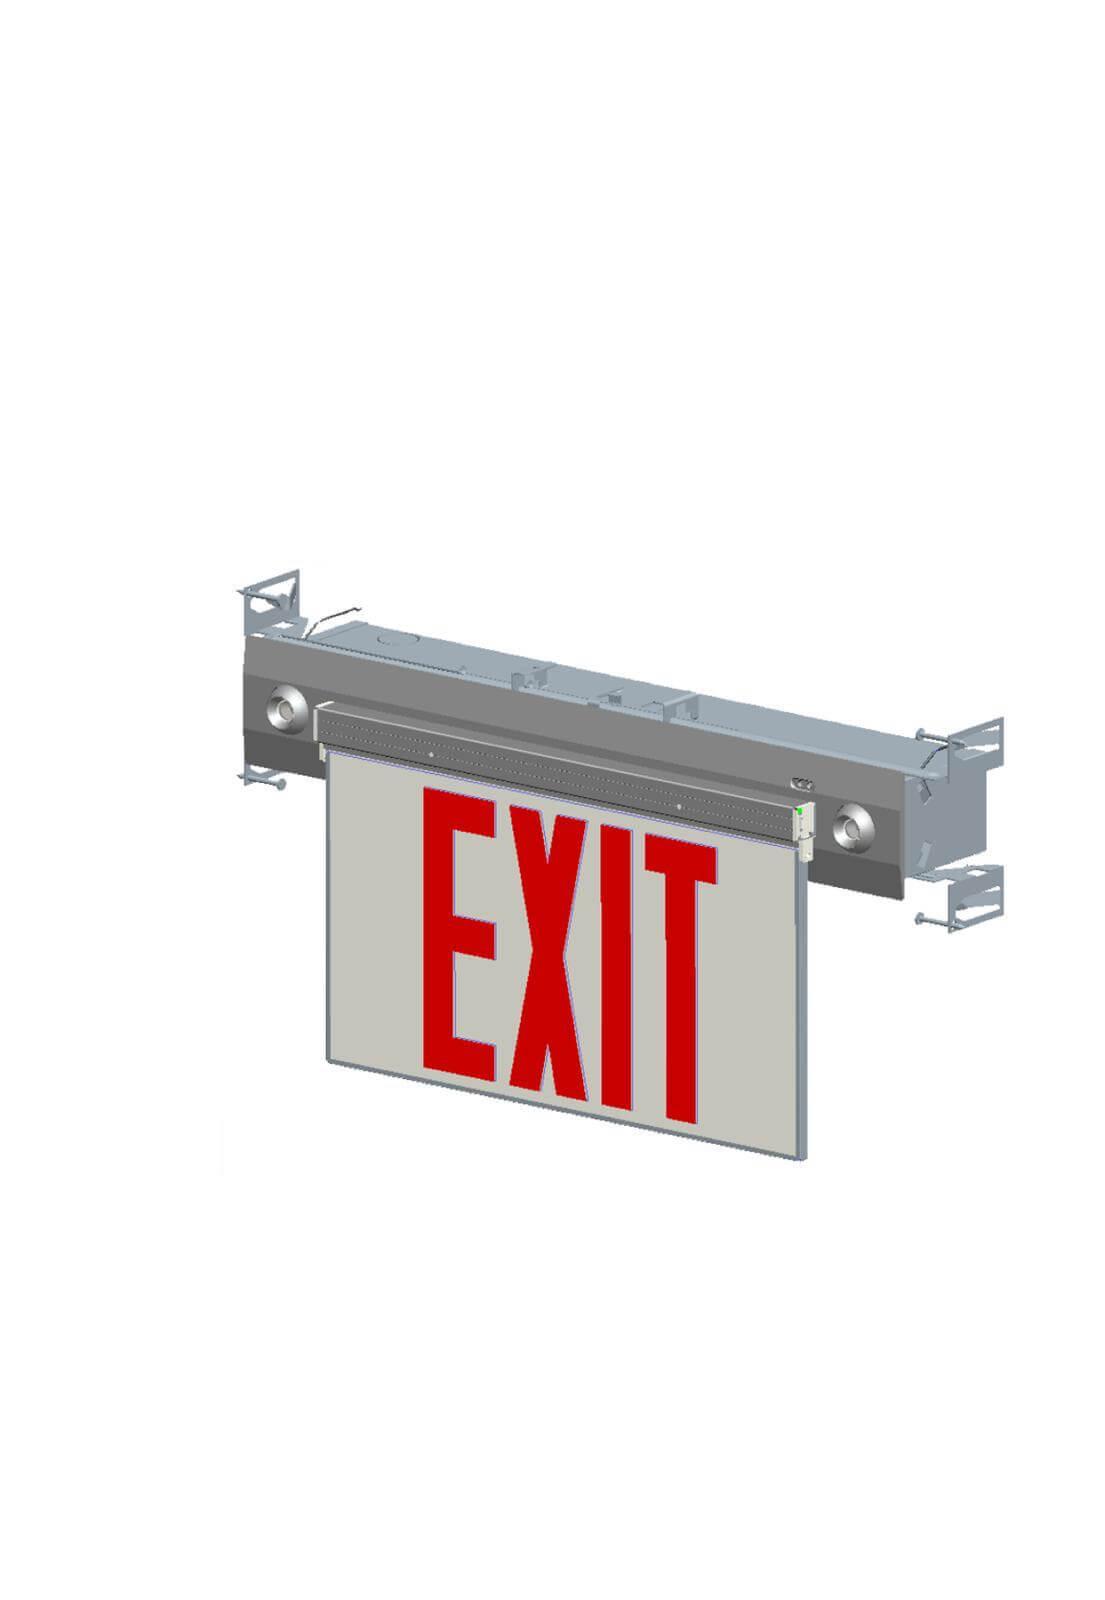 ExitSign.jpeg